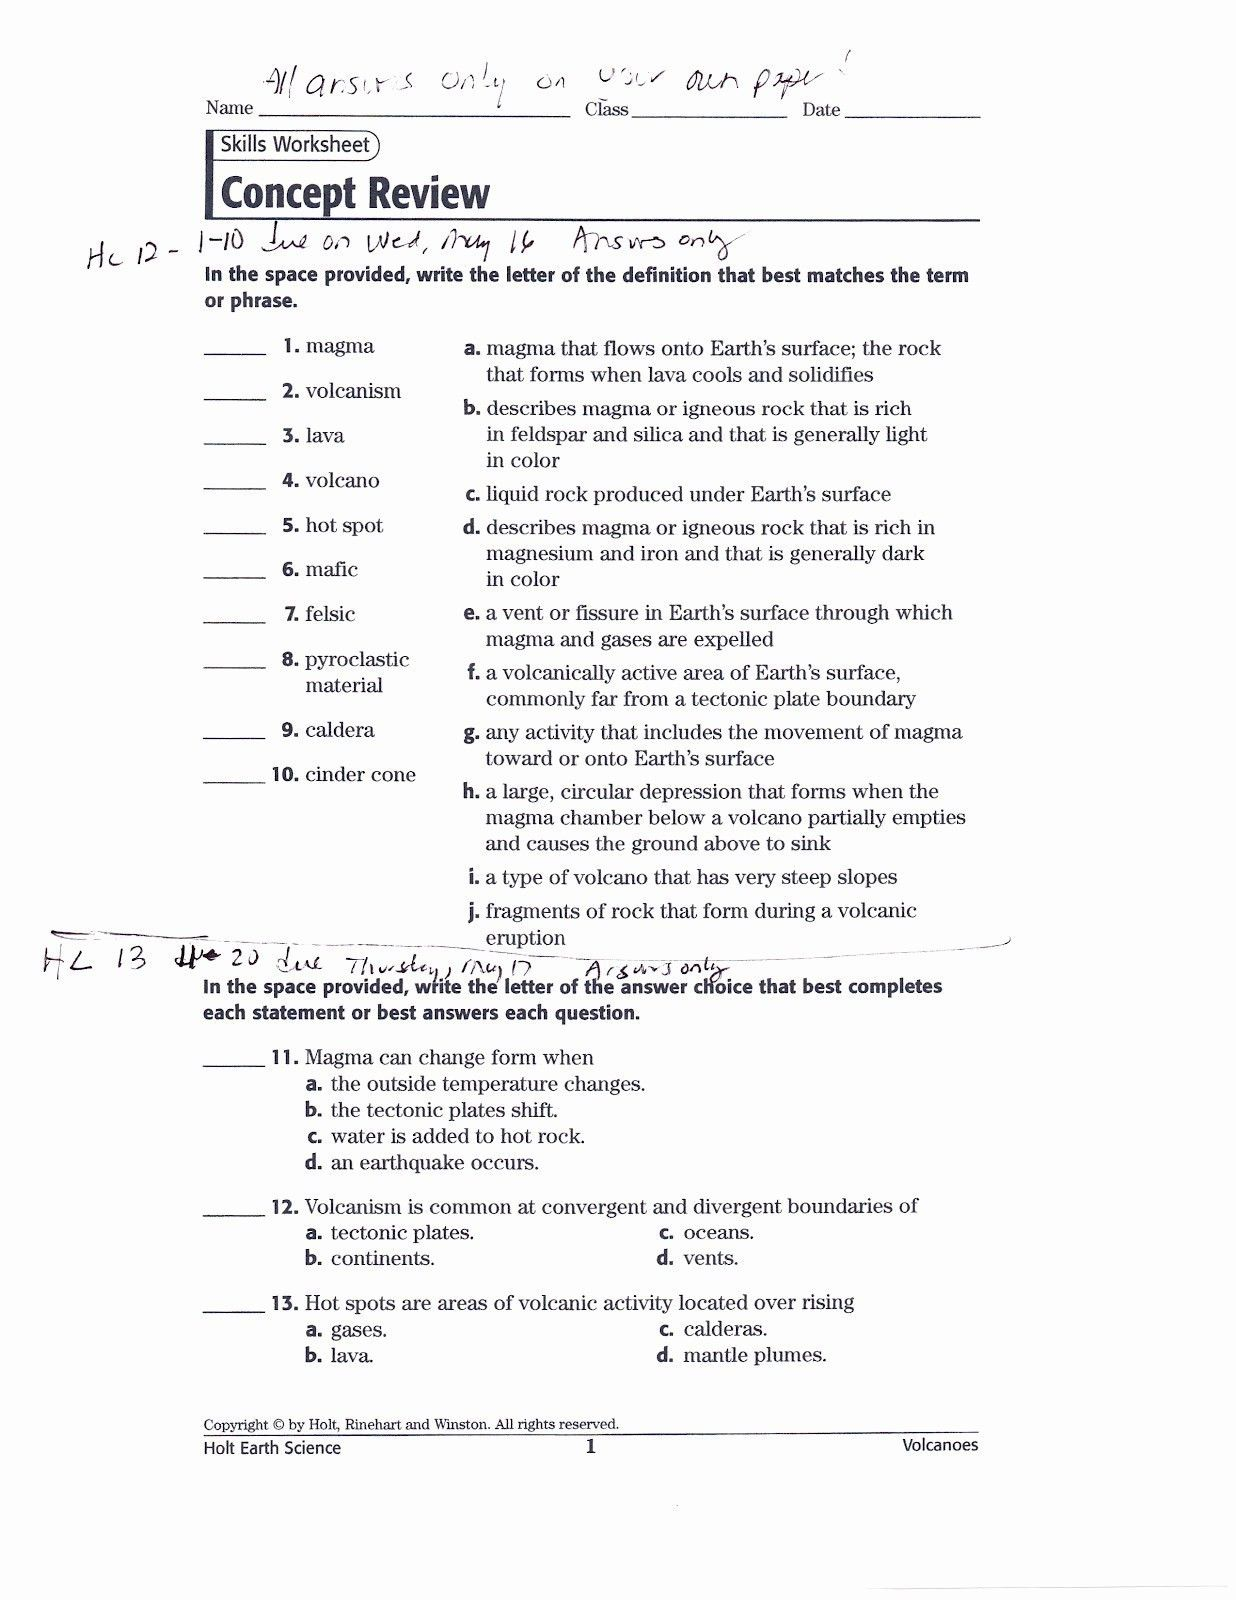 Science Skills Worksheet Answer Key